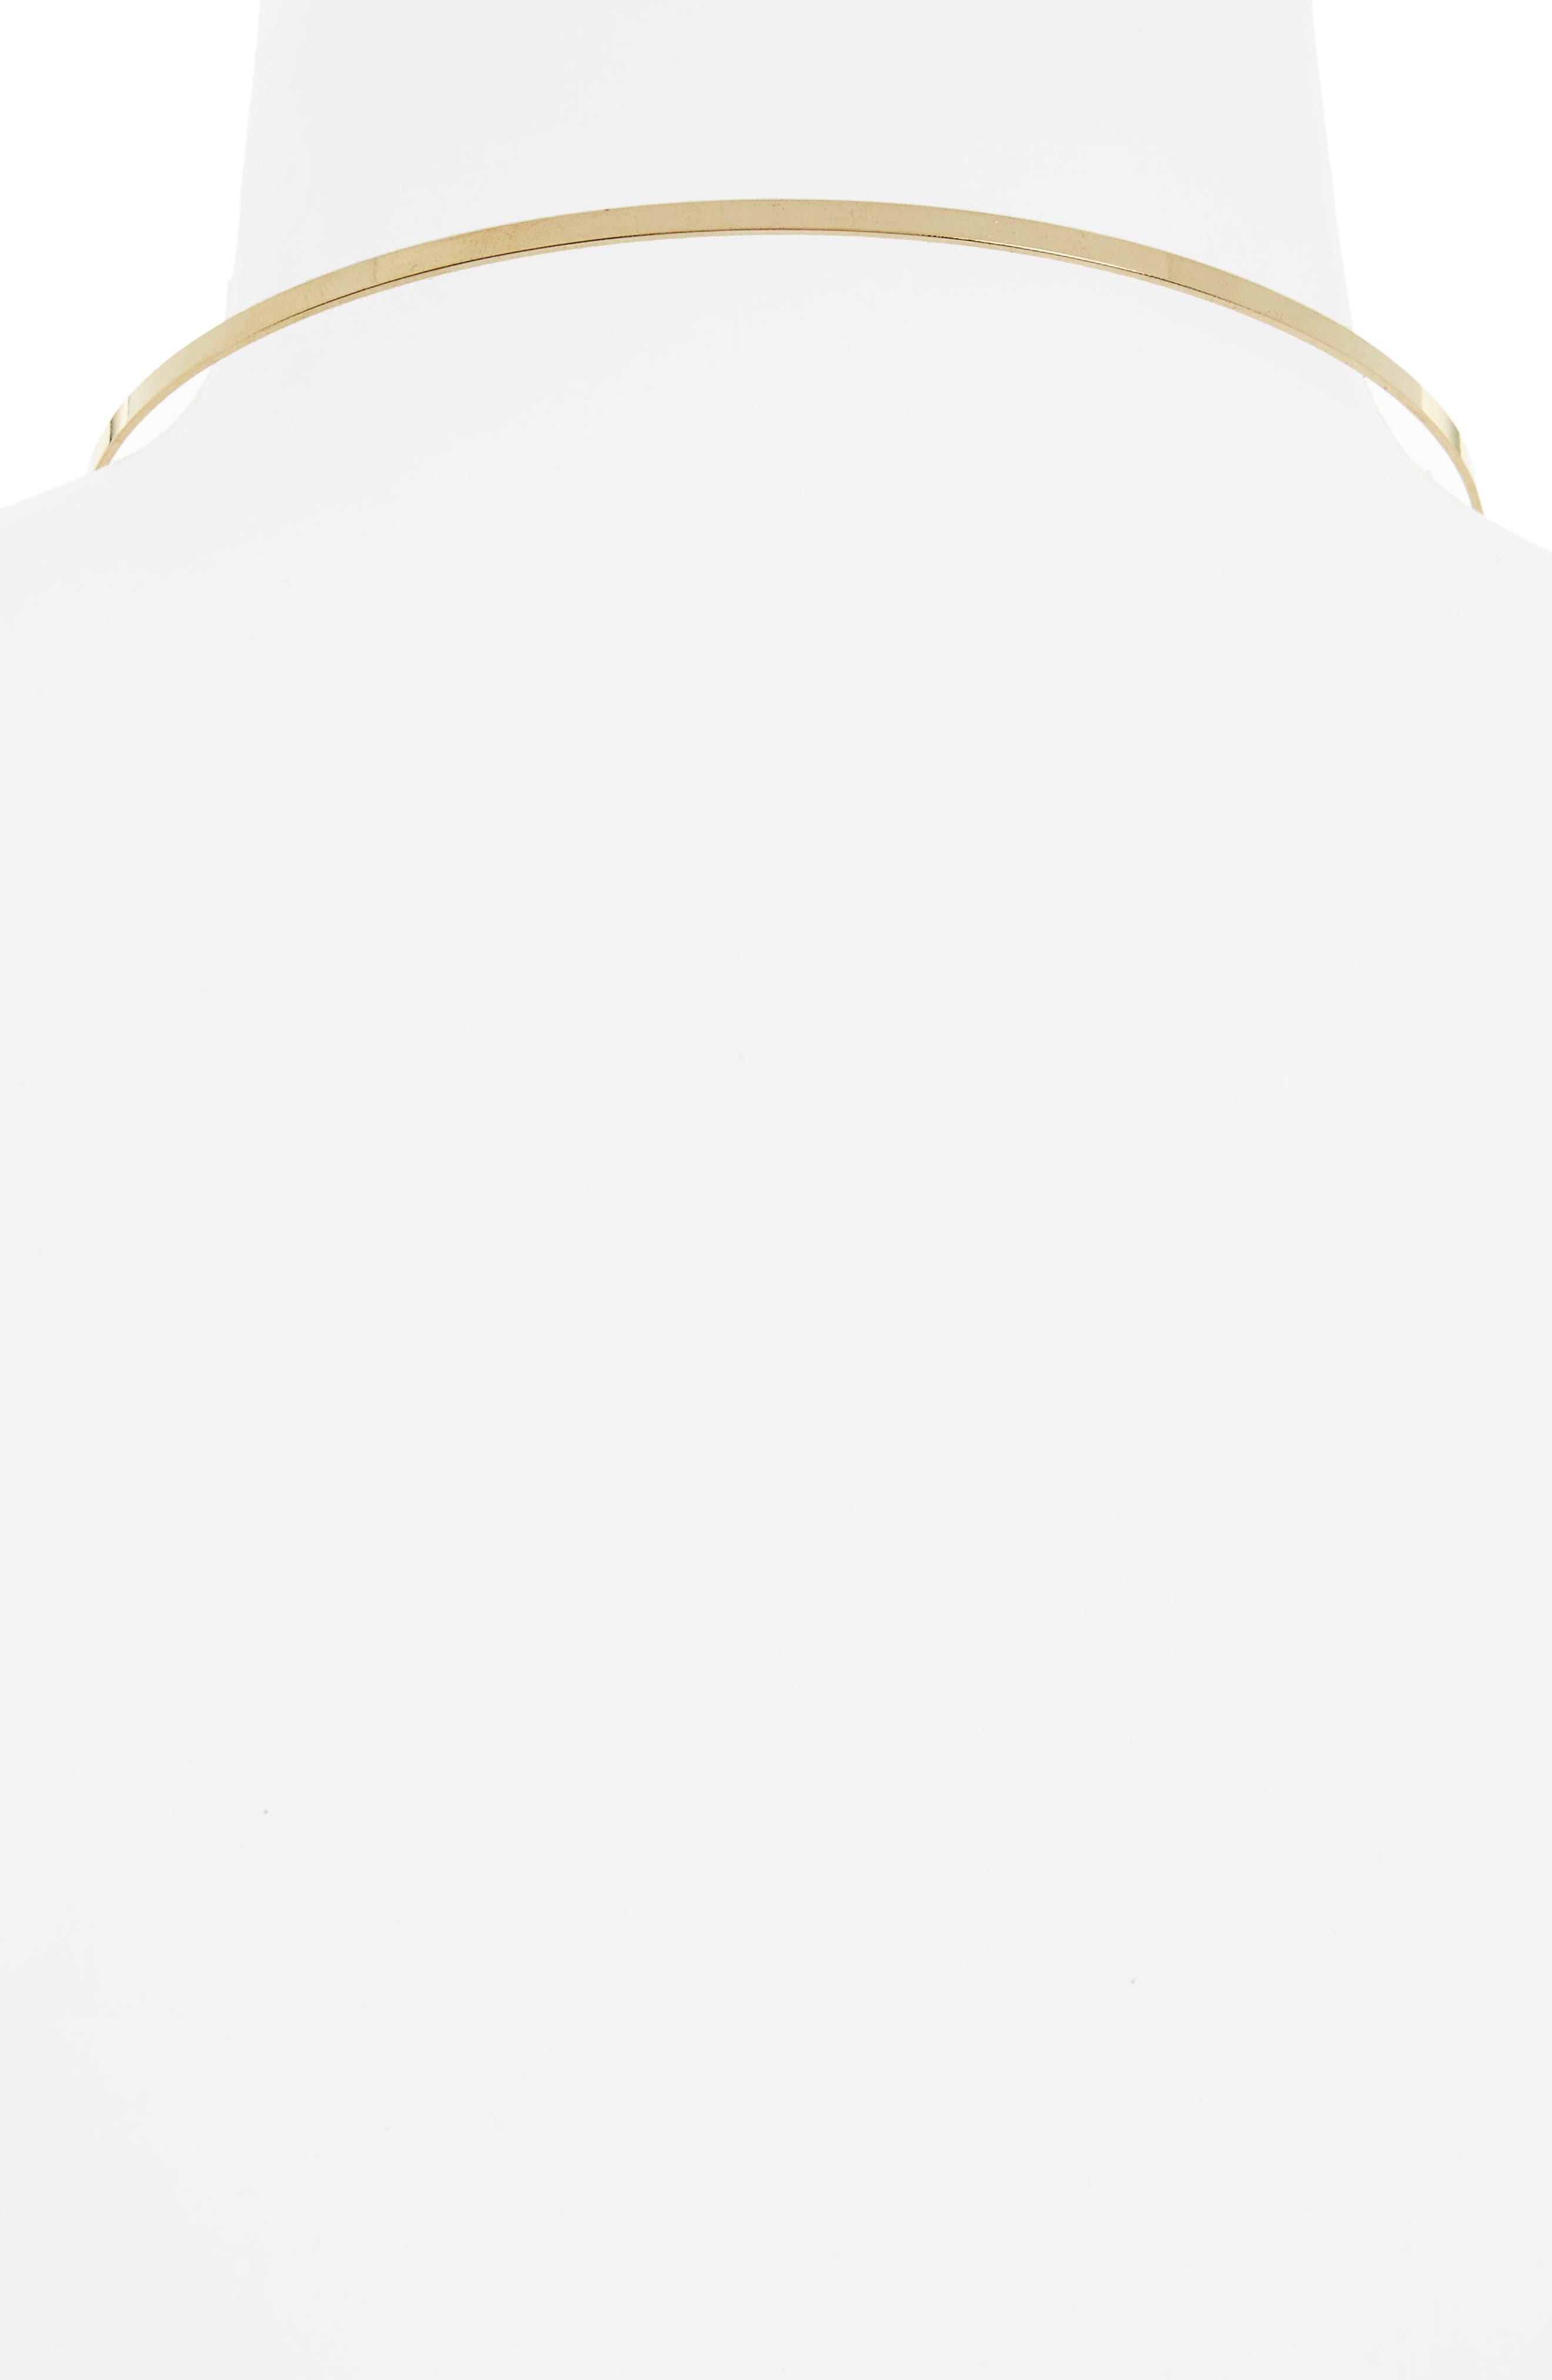 Gretta Chain Choker,                             Alternate thumbnail 2, color,                             Gold